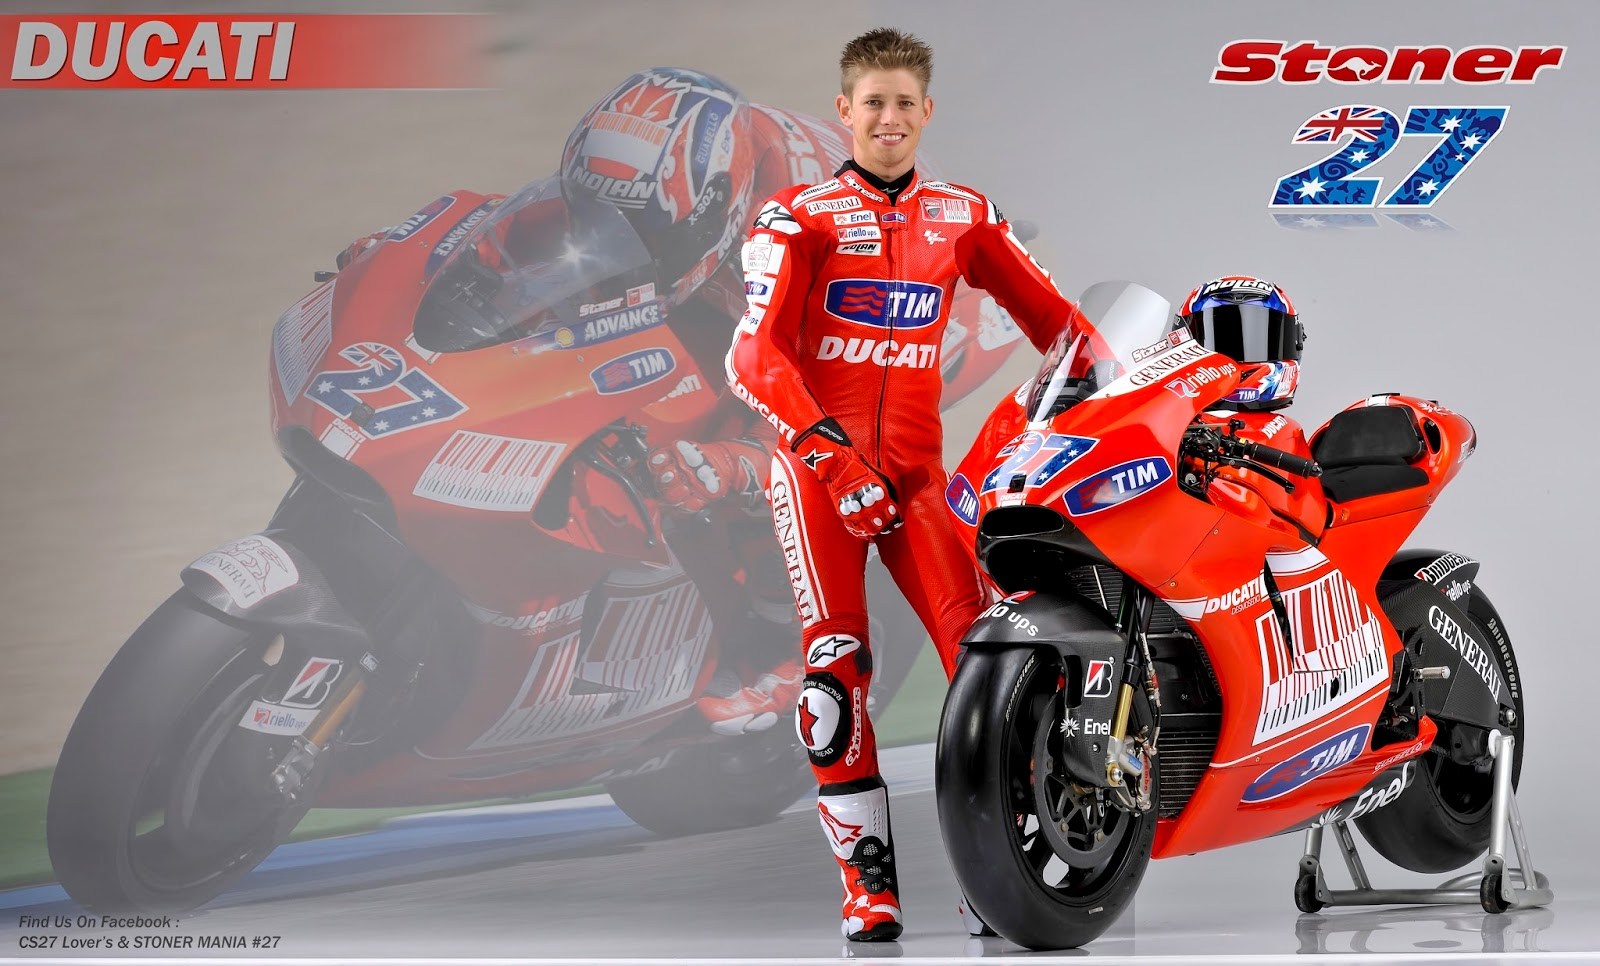 Redi Stoner Casey 2016 Ducati Wallpaper HD